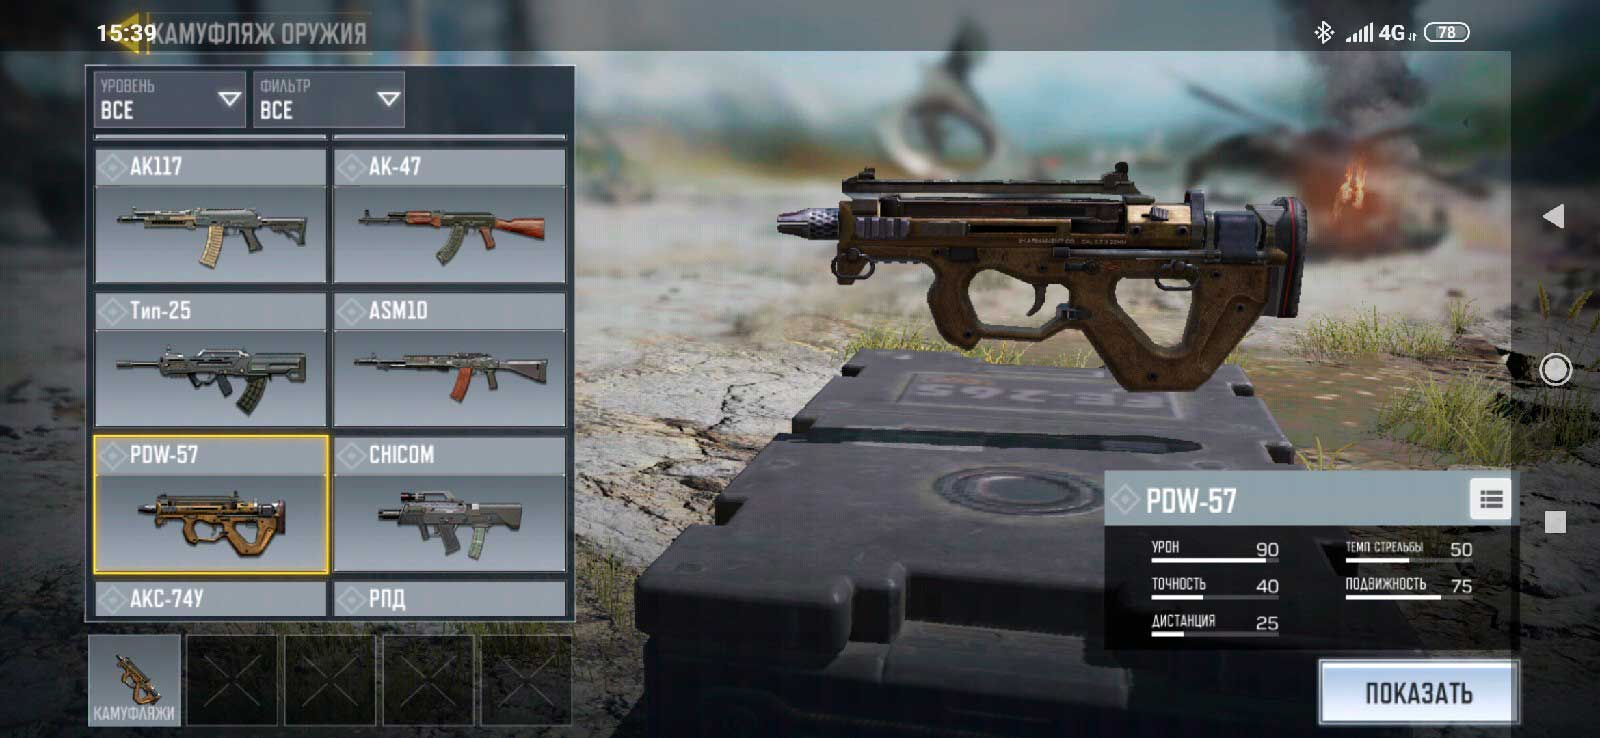 пистолеты-пулеметы-в-call-of-muty-mobile